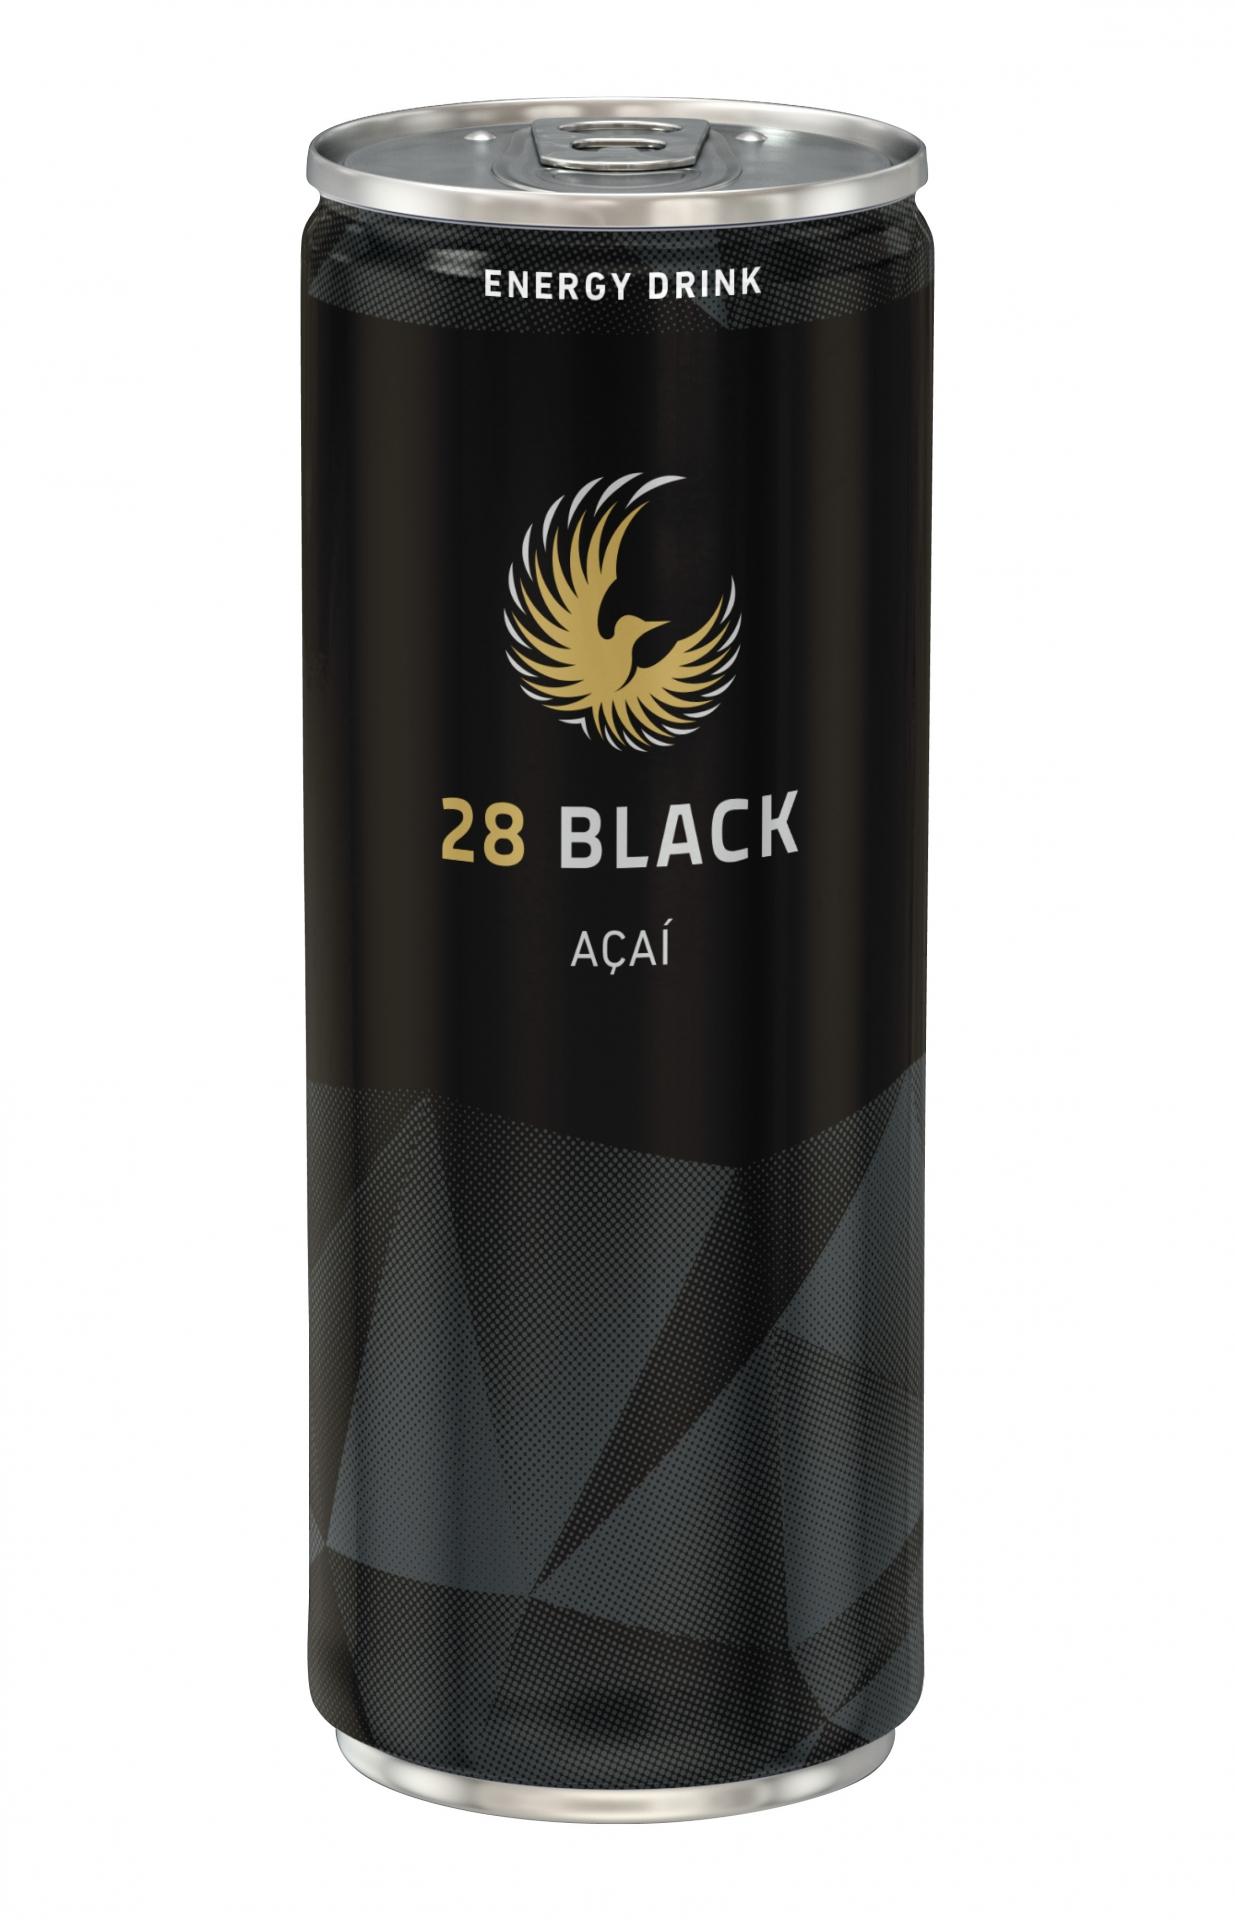 28 BLACK AÇAÍ 24x0,25 l Dose